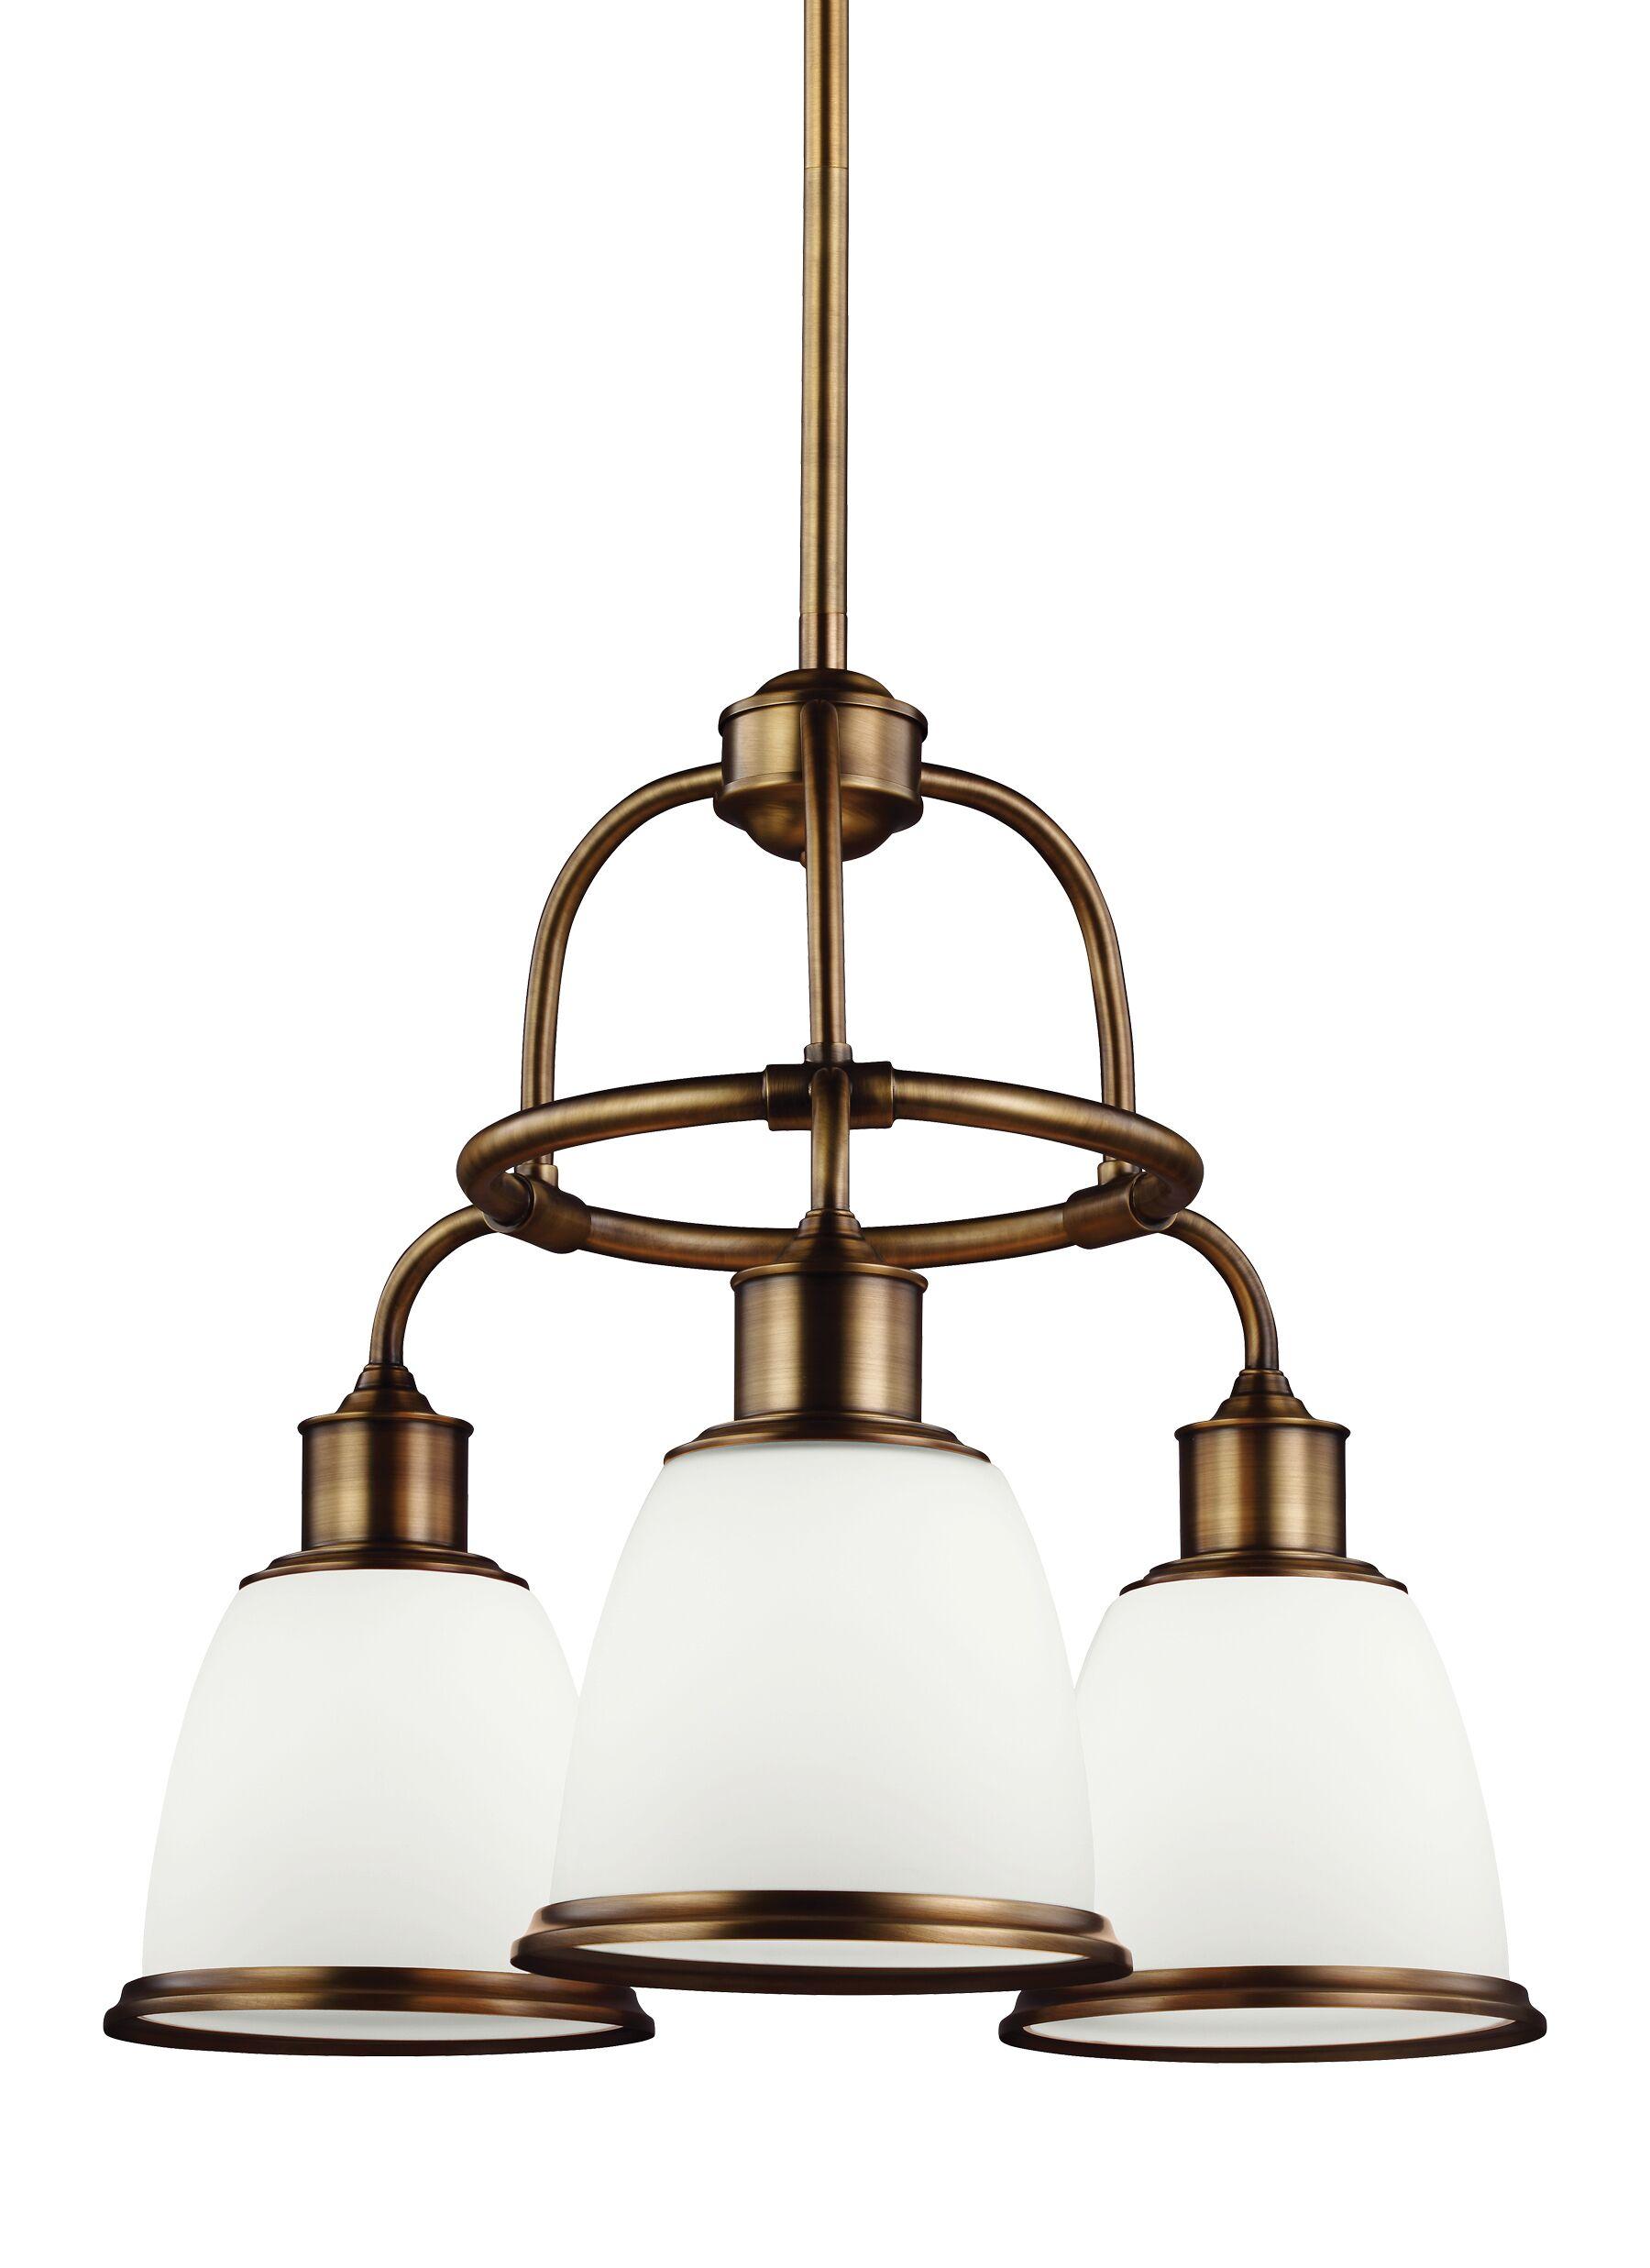 Celestine 3-Light Shaded Chandelier Finish: Aged Brass